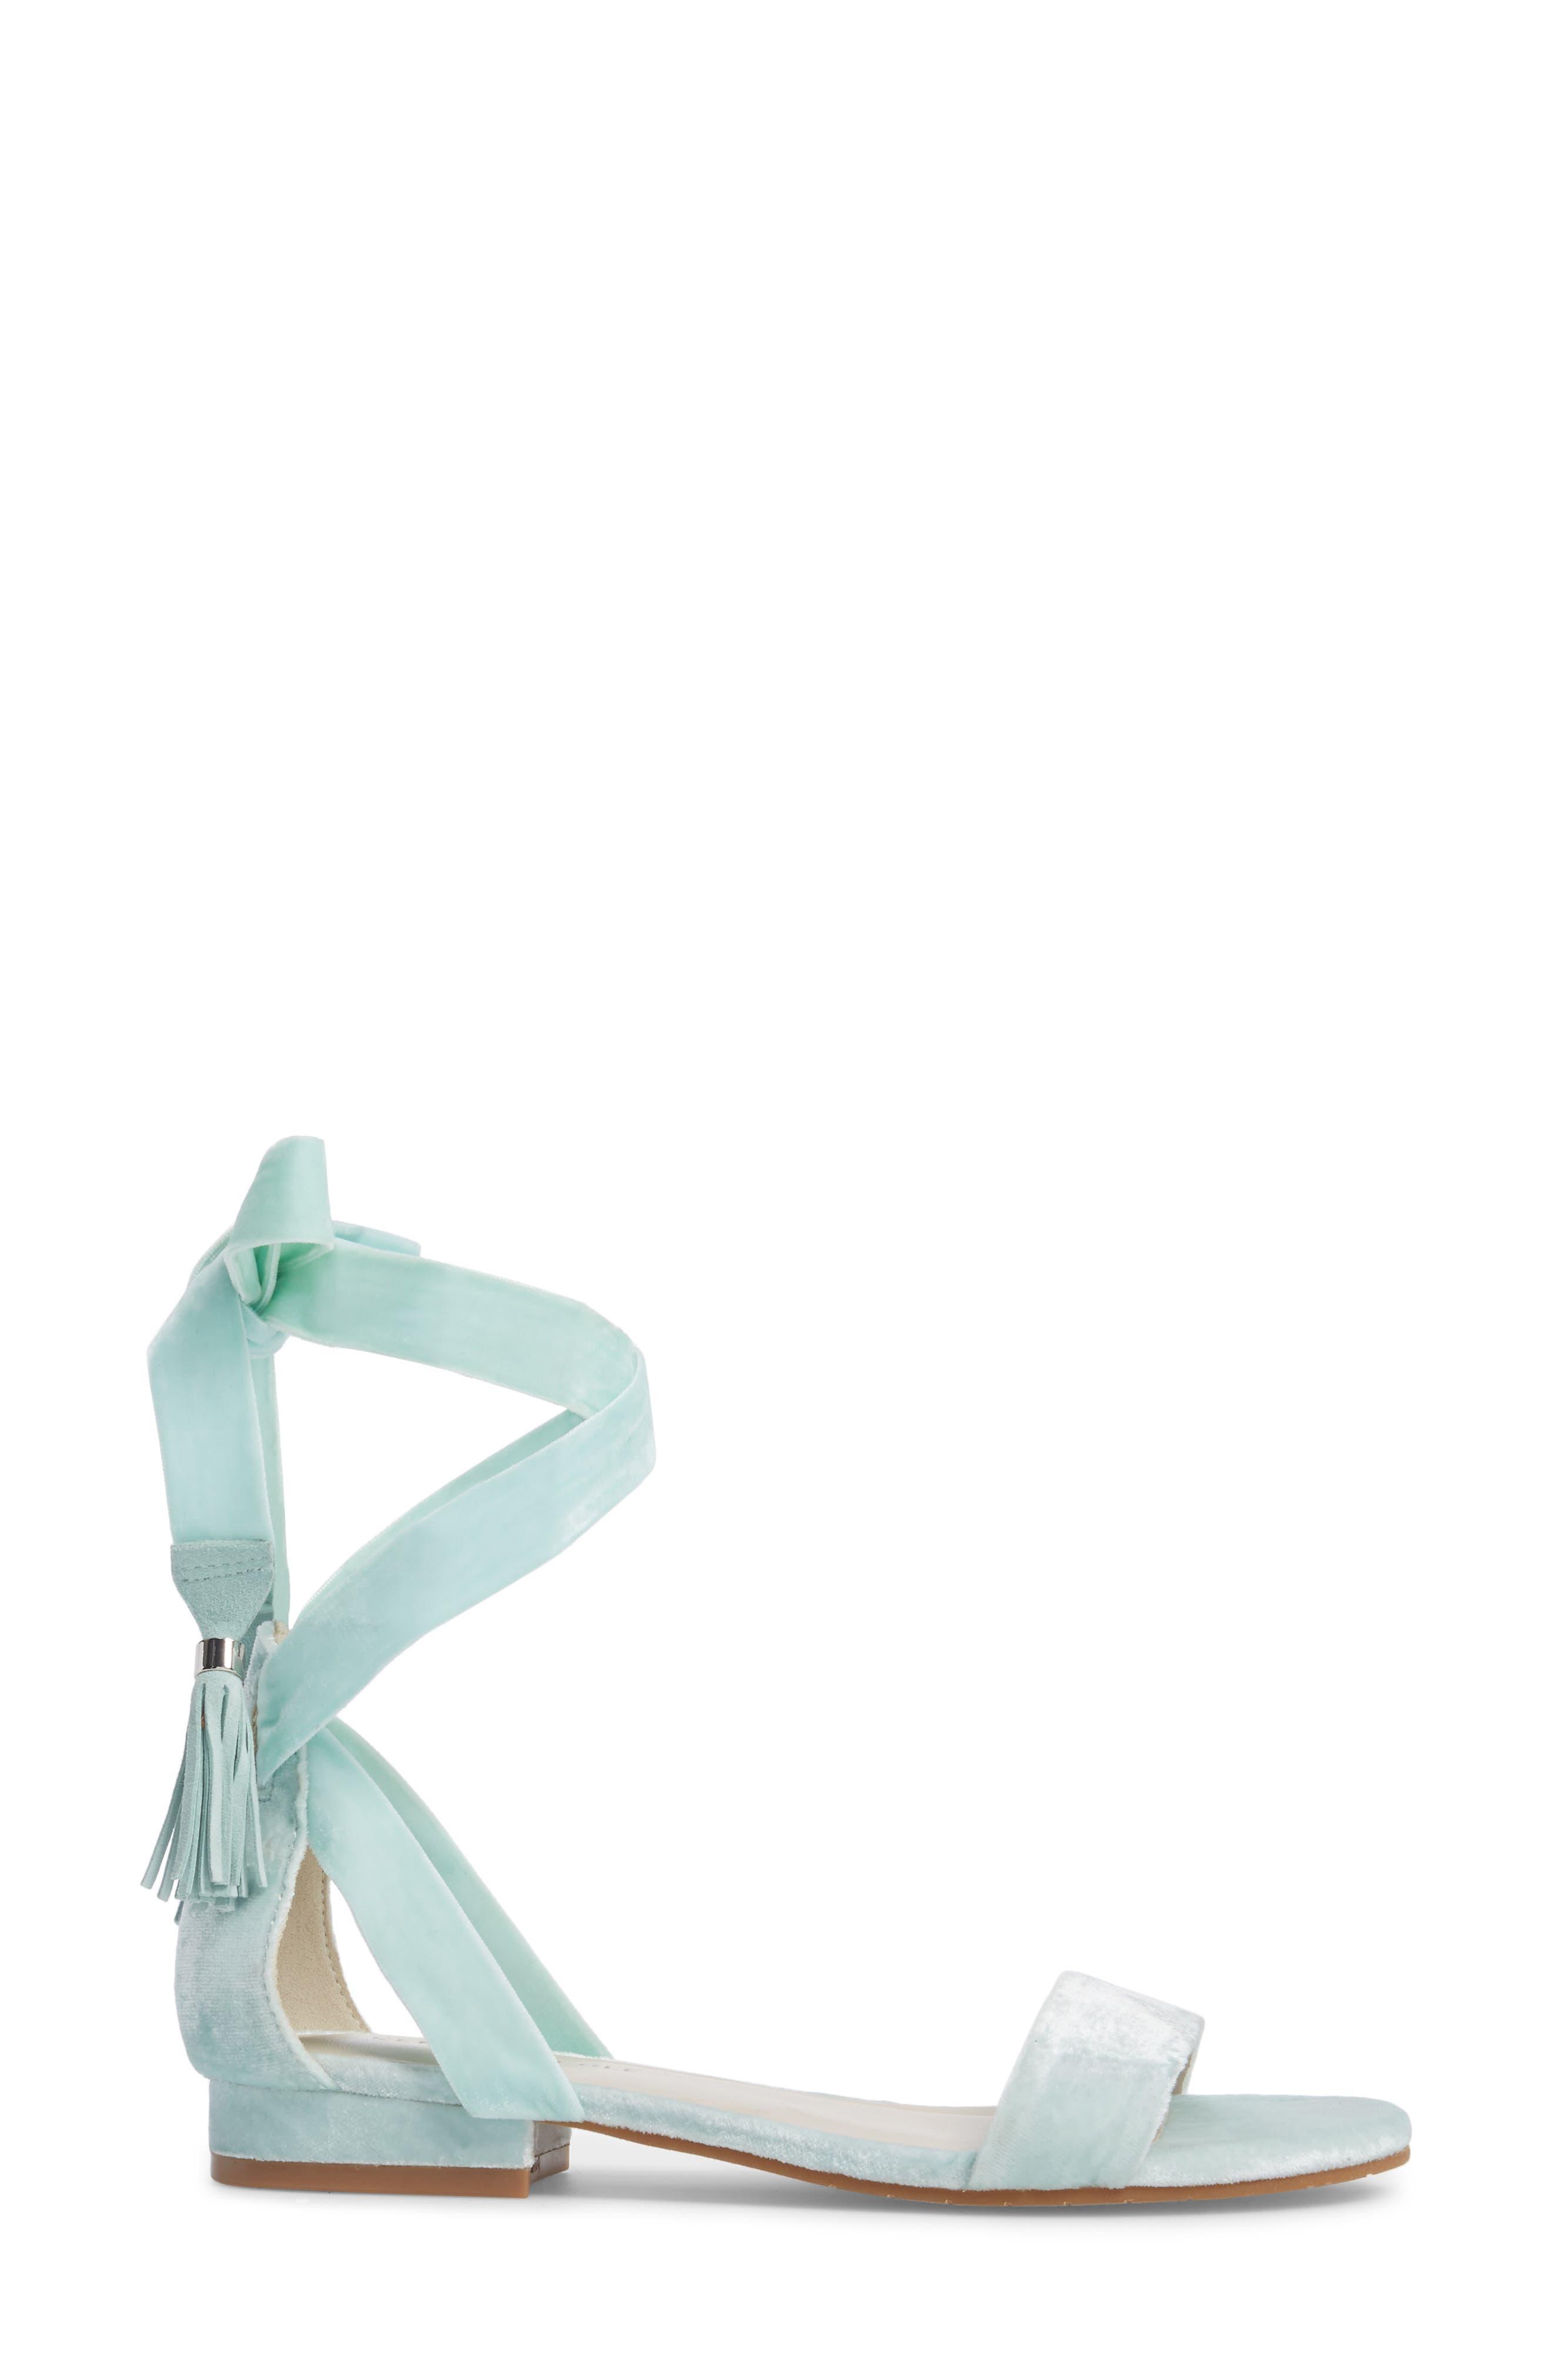 Valen Tassel Lace-Up Sandal,                             Alternate thumbnail 36, color,